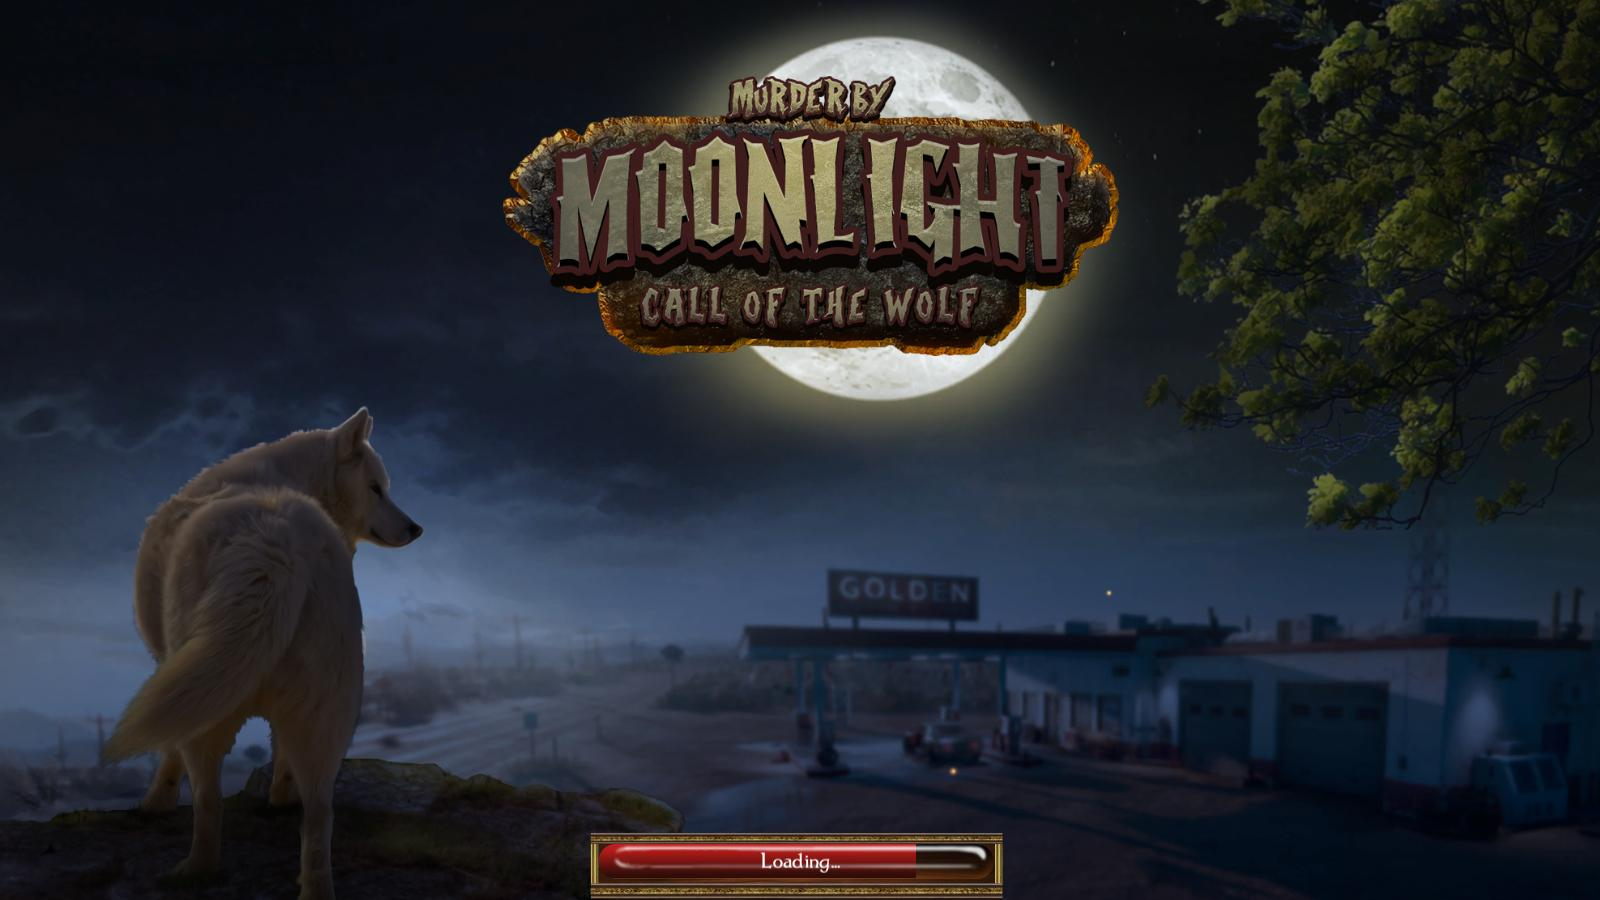 Убийство при лунном свете: Зов волка | Murder by Moonlight: Call of the Wolf (En)